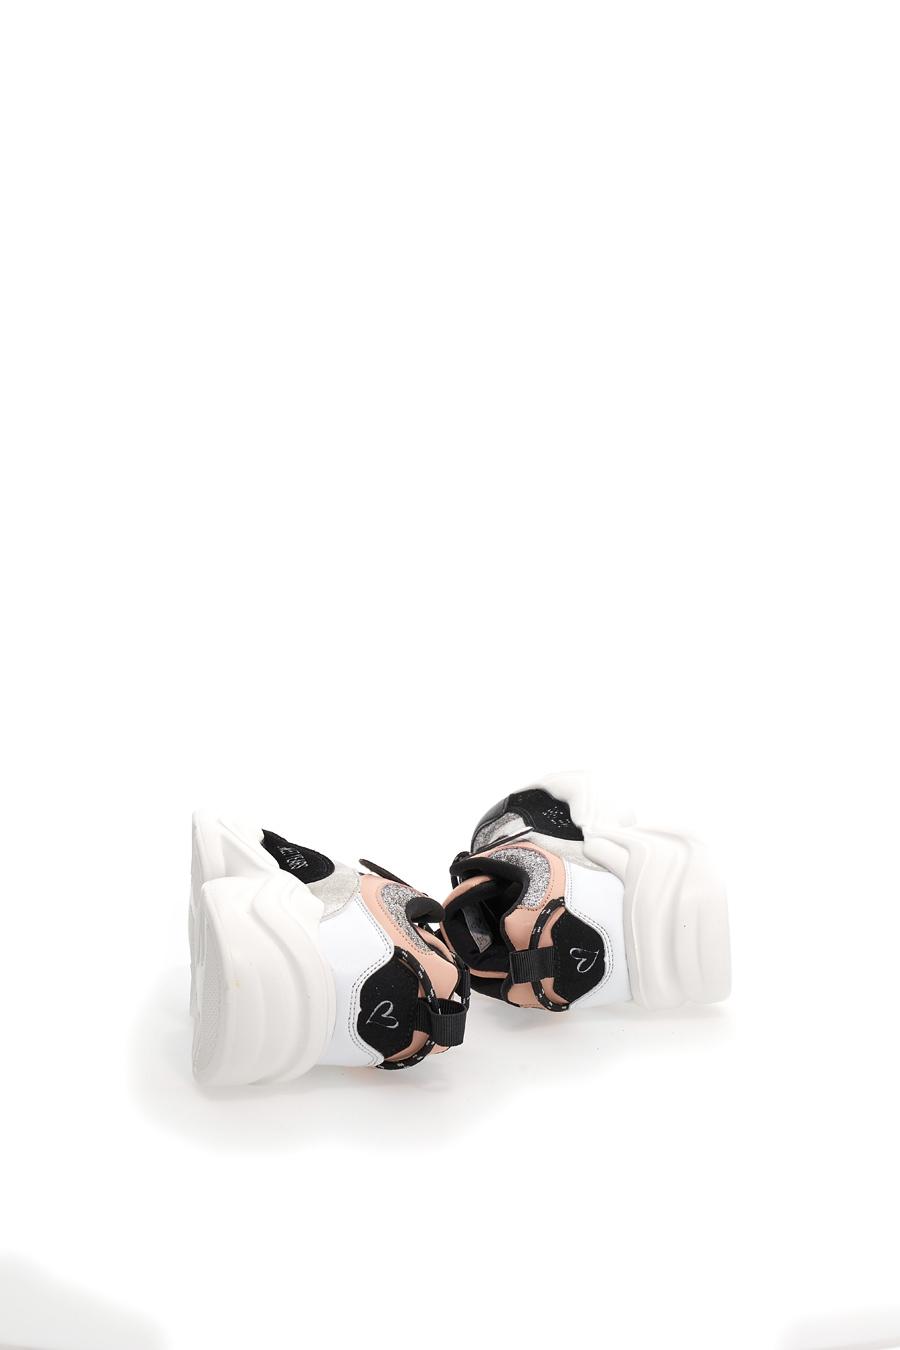 SNEAKERS donna bianco SWEET YEARS 8027 | Pittarello